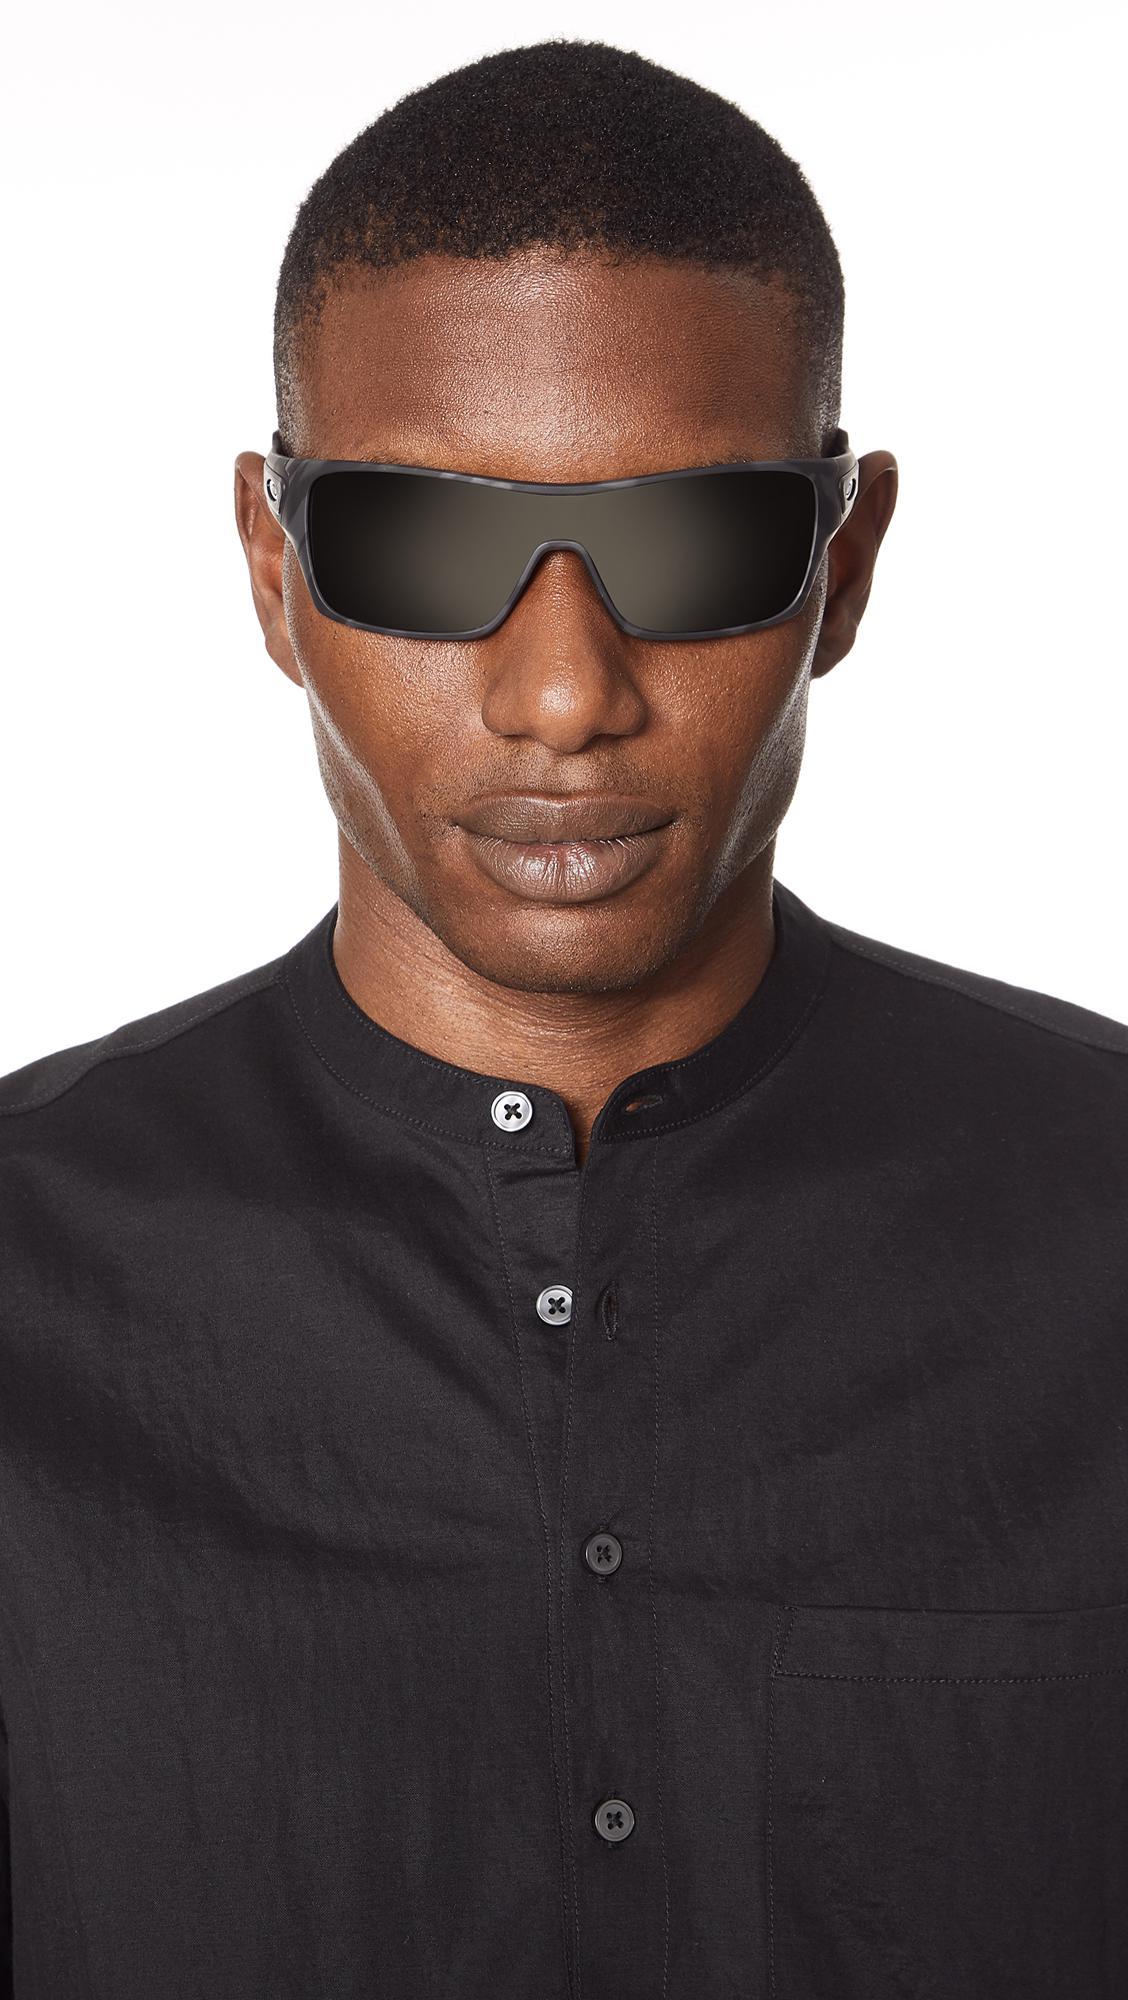 e5854eb493 Oakley - Black Turbine Rotor Polarized Sunglasses for Men - Lyst. View  fullscreen